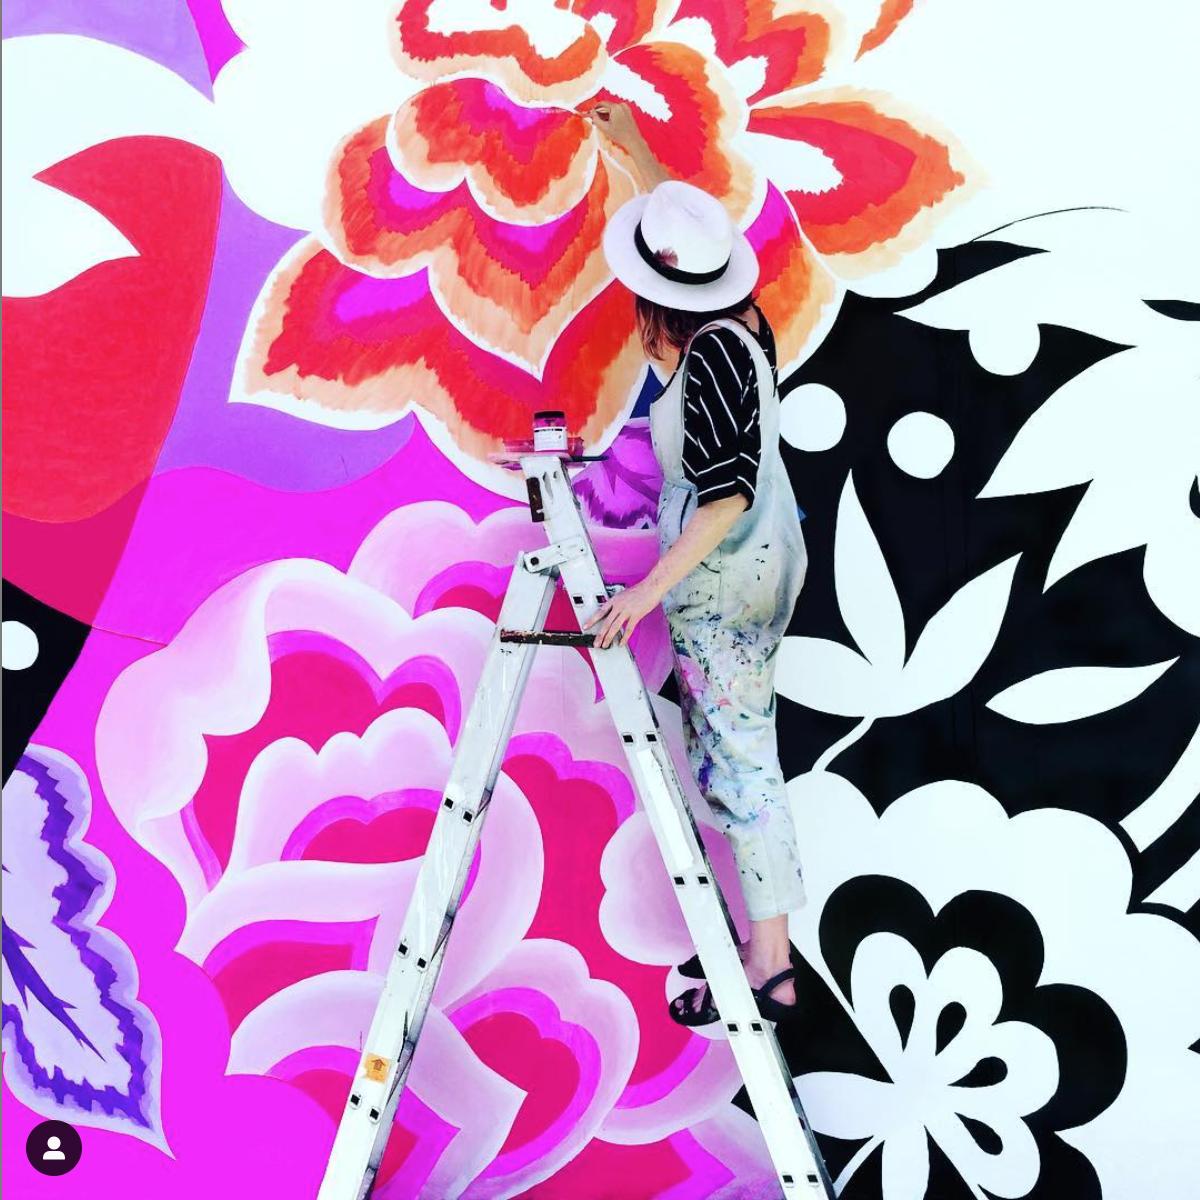 mural-artist-shannon.png